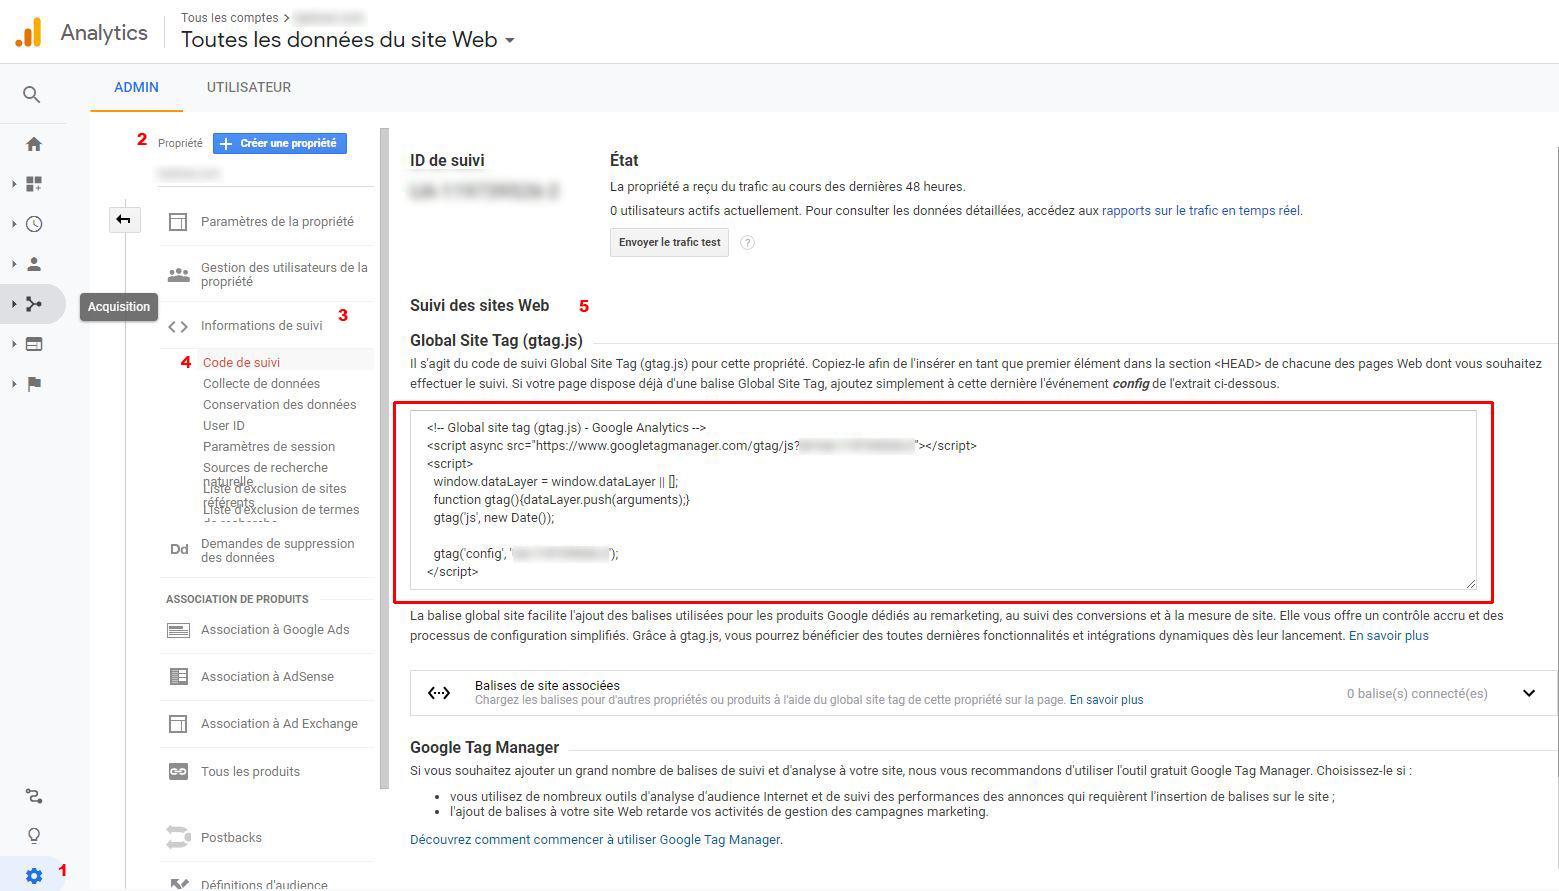 Code de suivi Google Anlytics